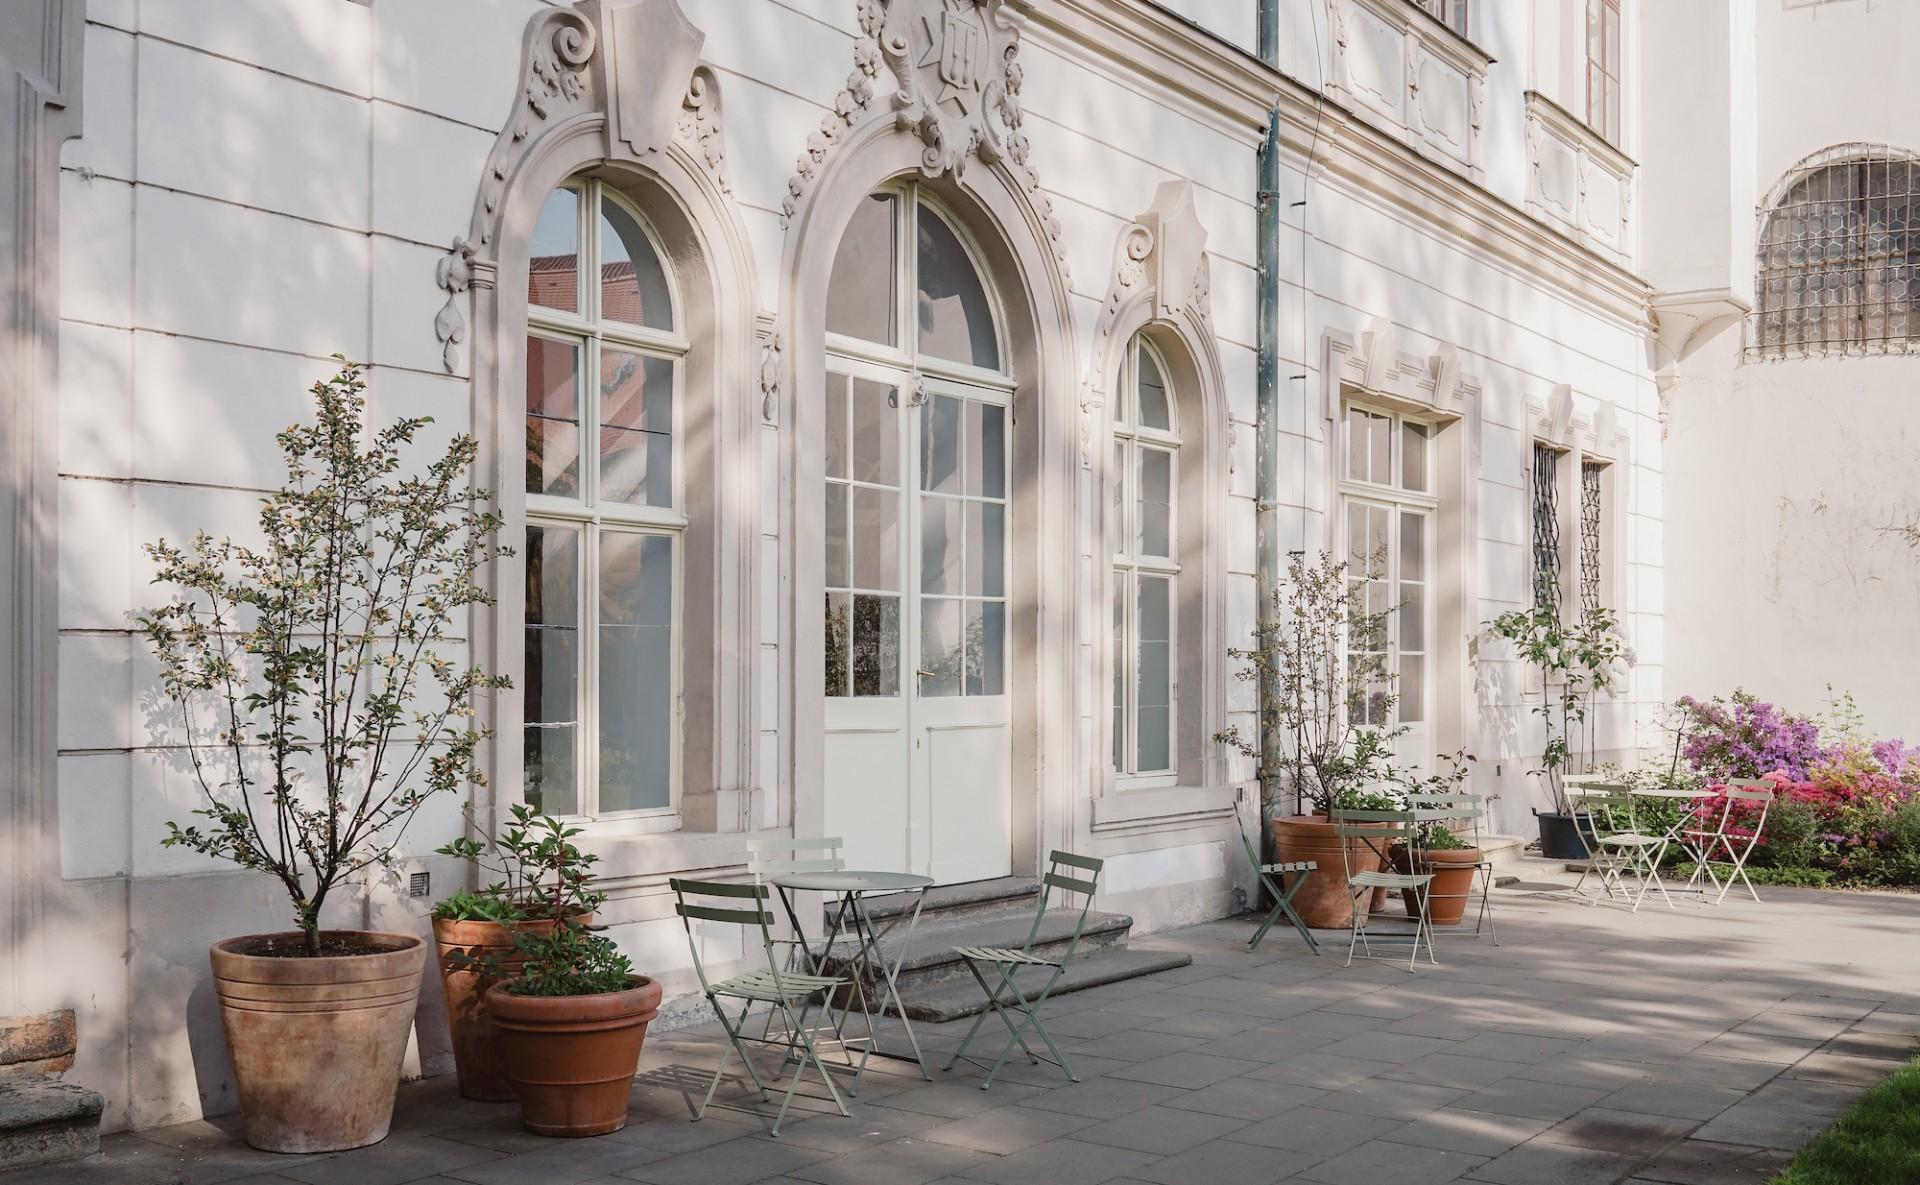 Garden for rent Prague 1